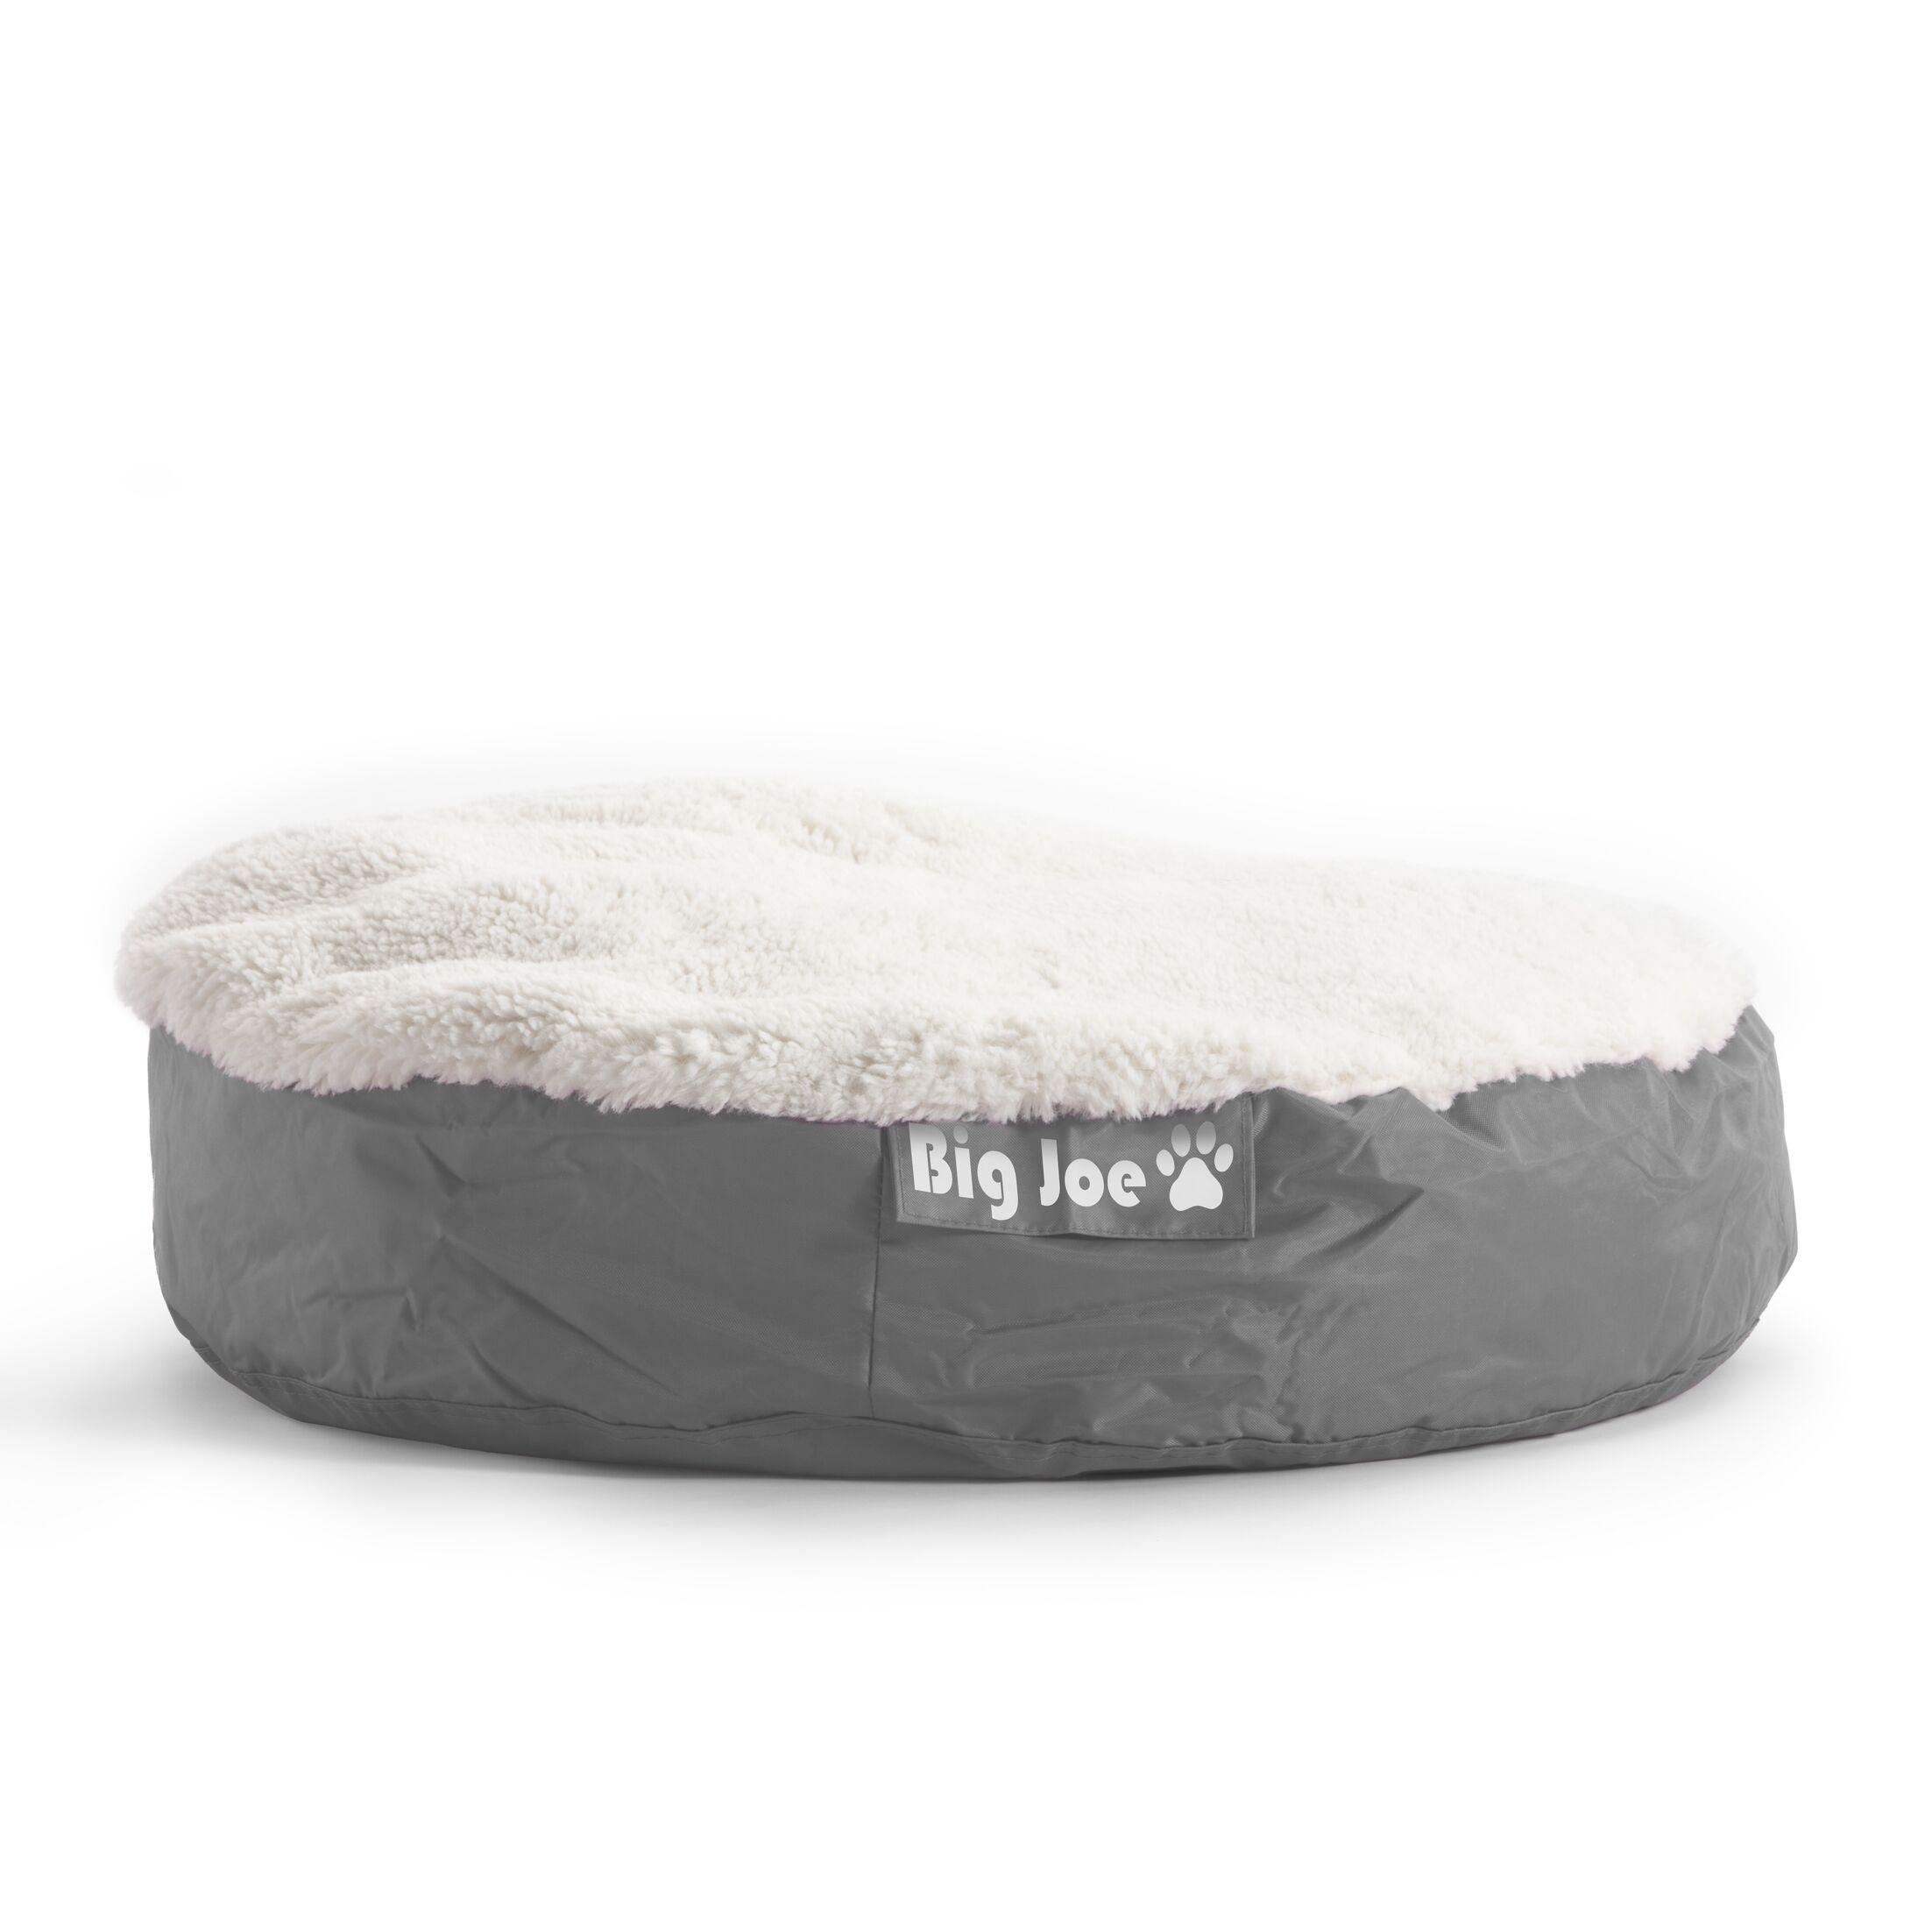 Big Joe SmartMax Pet Bed Color: Grey, Size: Large (36